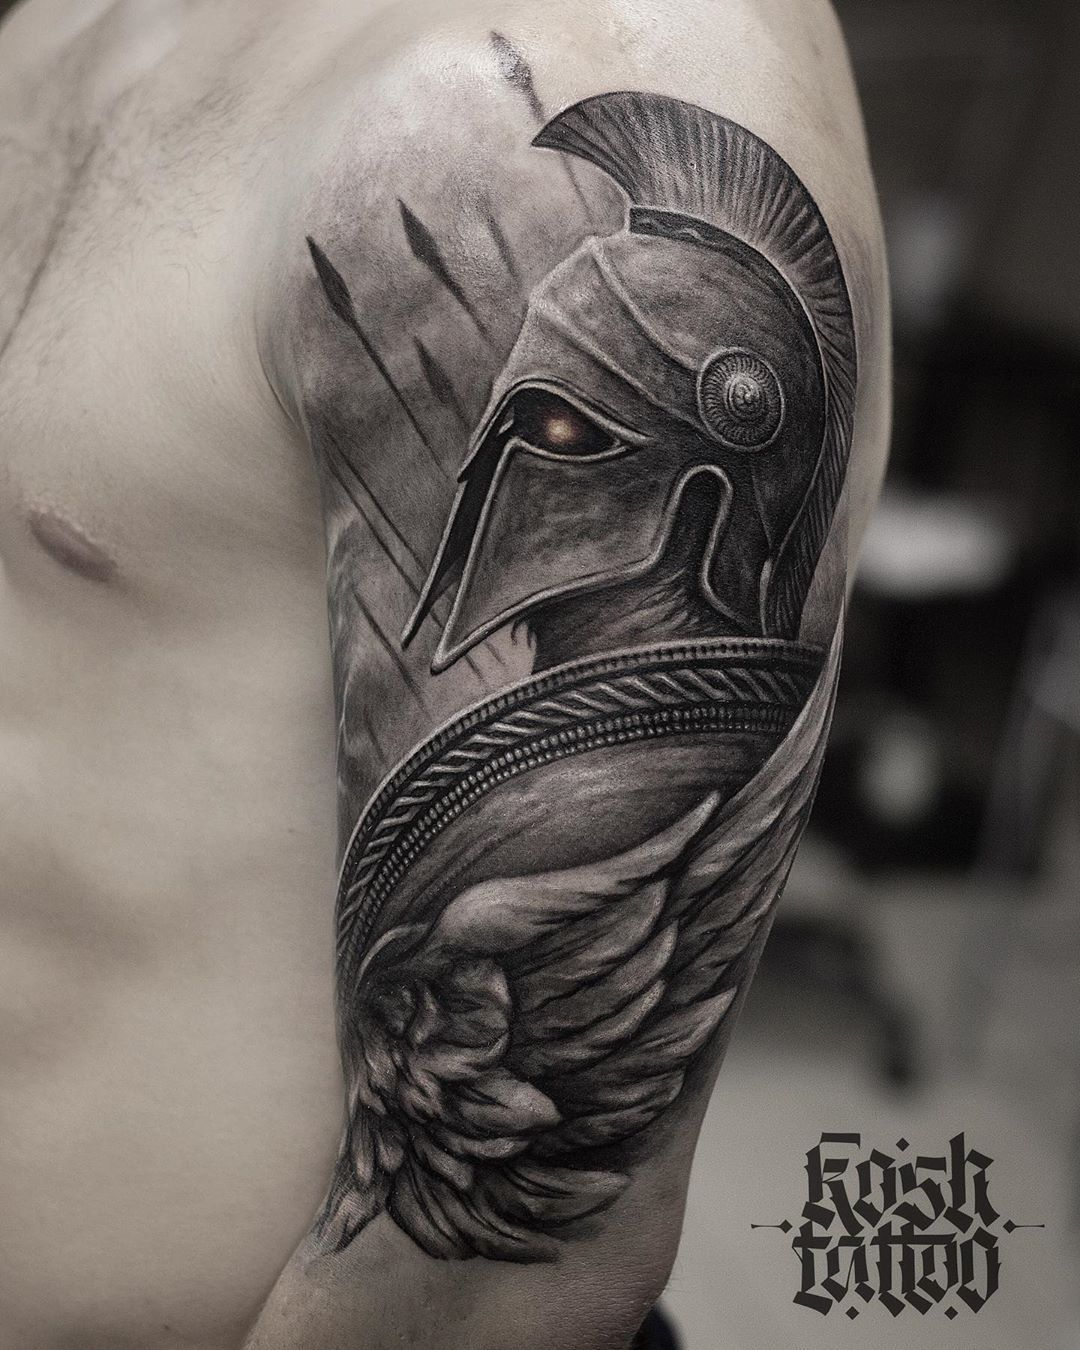 Arm schulter tattoos männer Tattoo Vorlagen